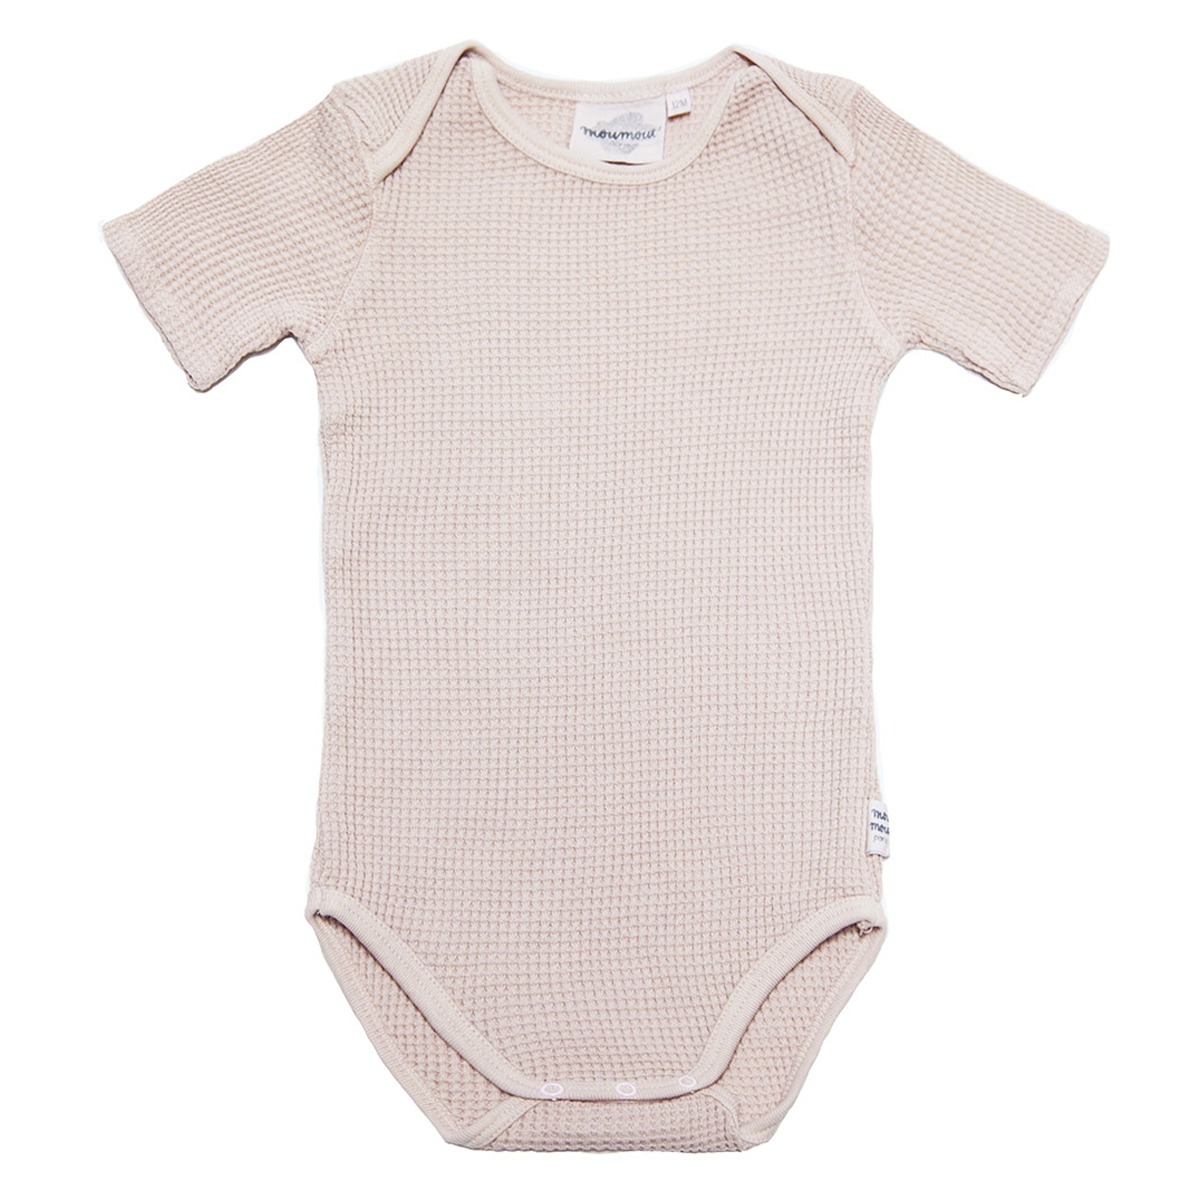 Body & Pyjama Body Raymond Bee Nude - 6 Mois